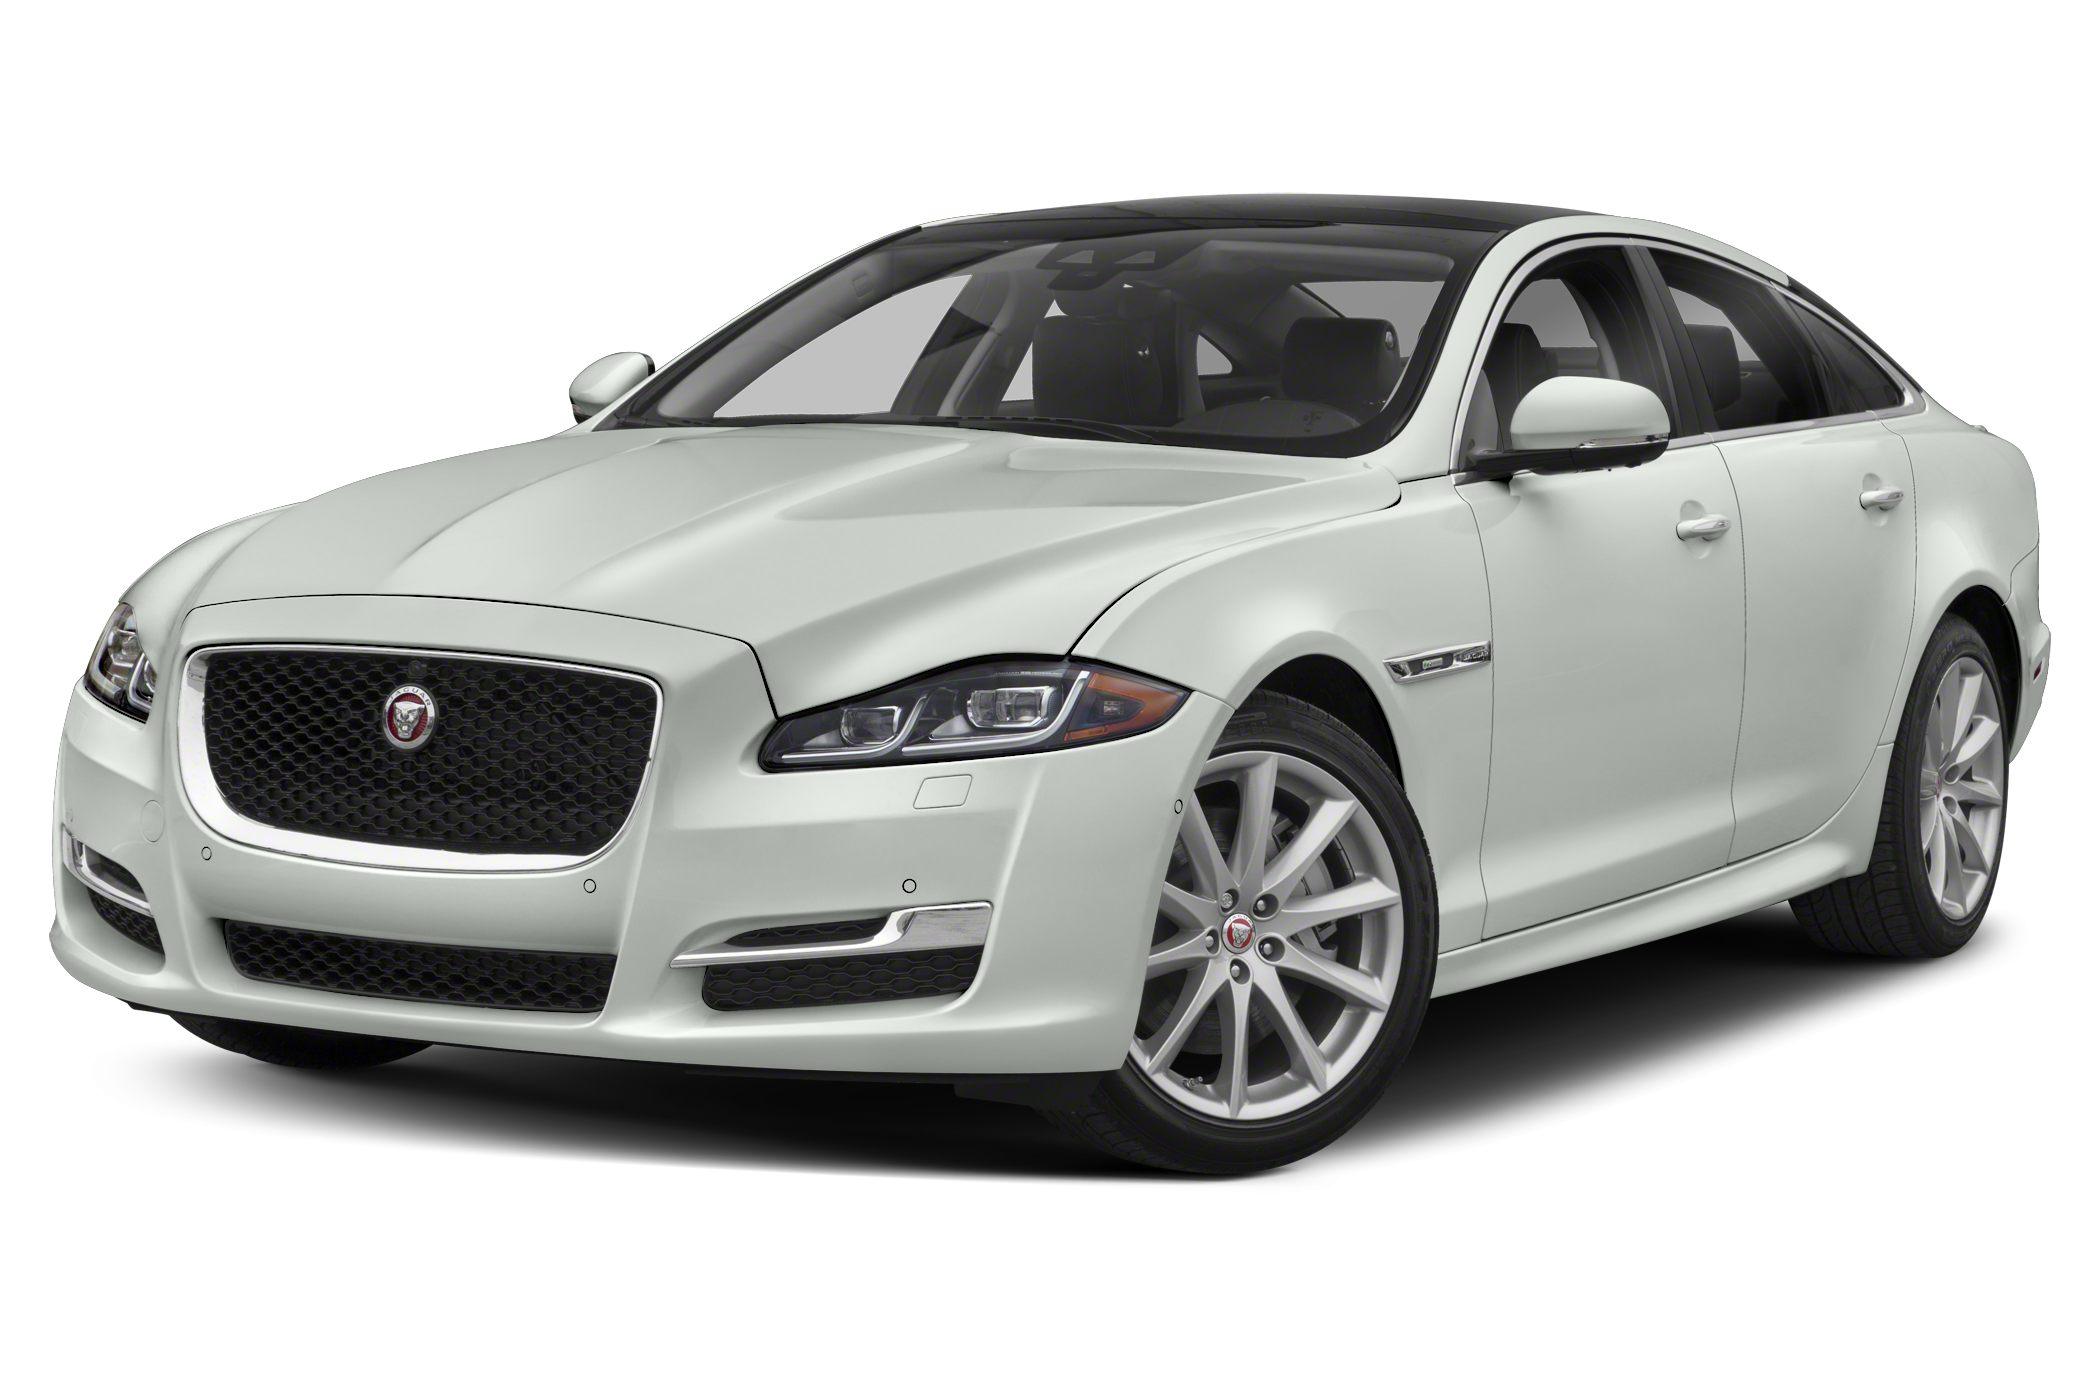 The Jaguar XJ could move to an EV platform like the Tesla Model S ...